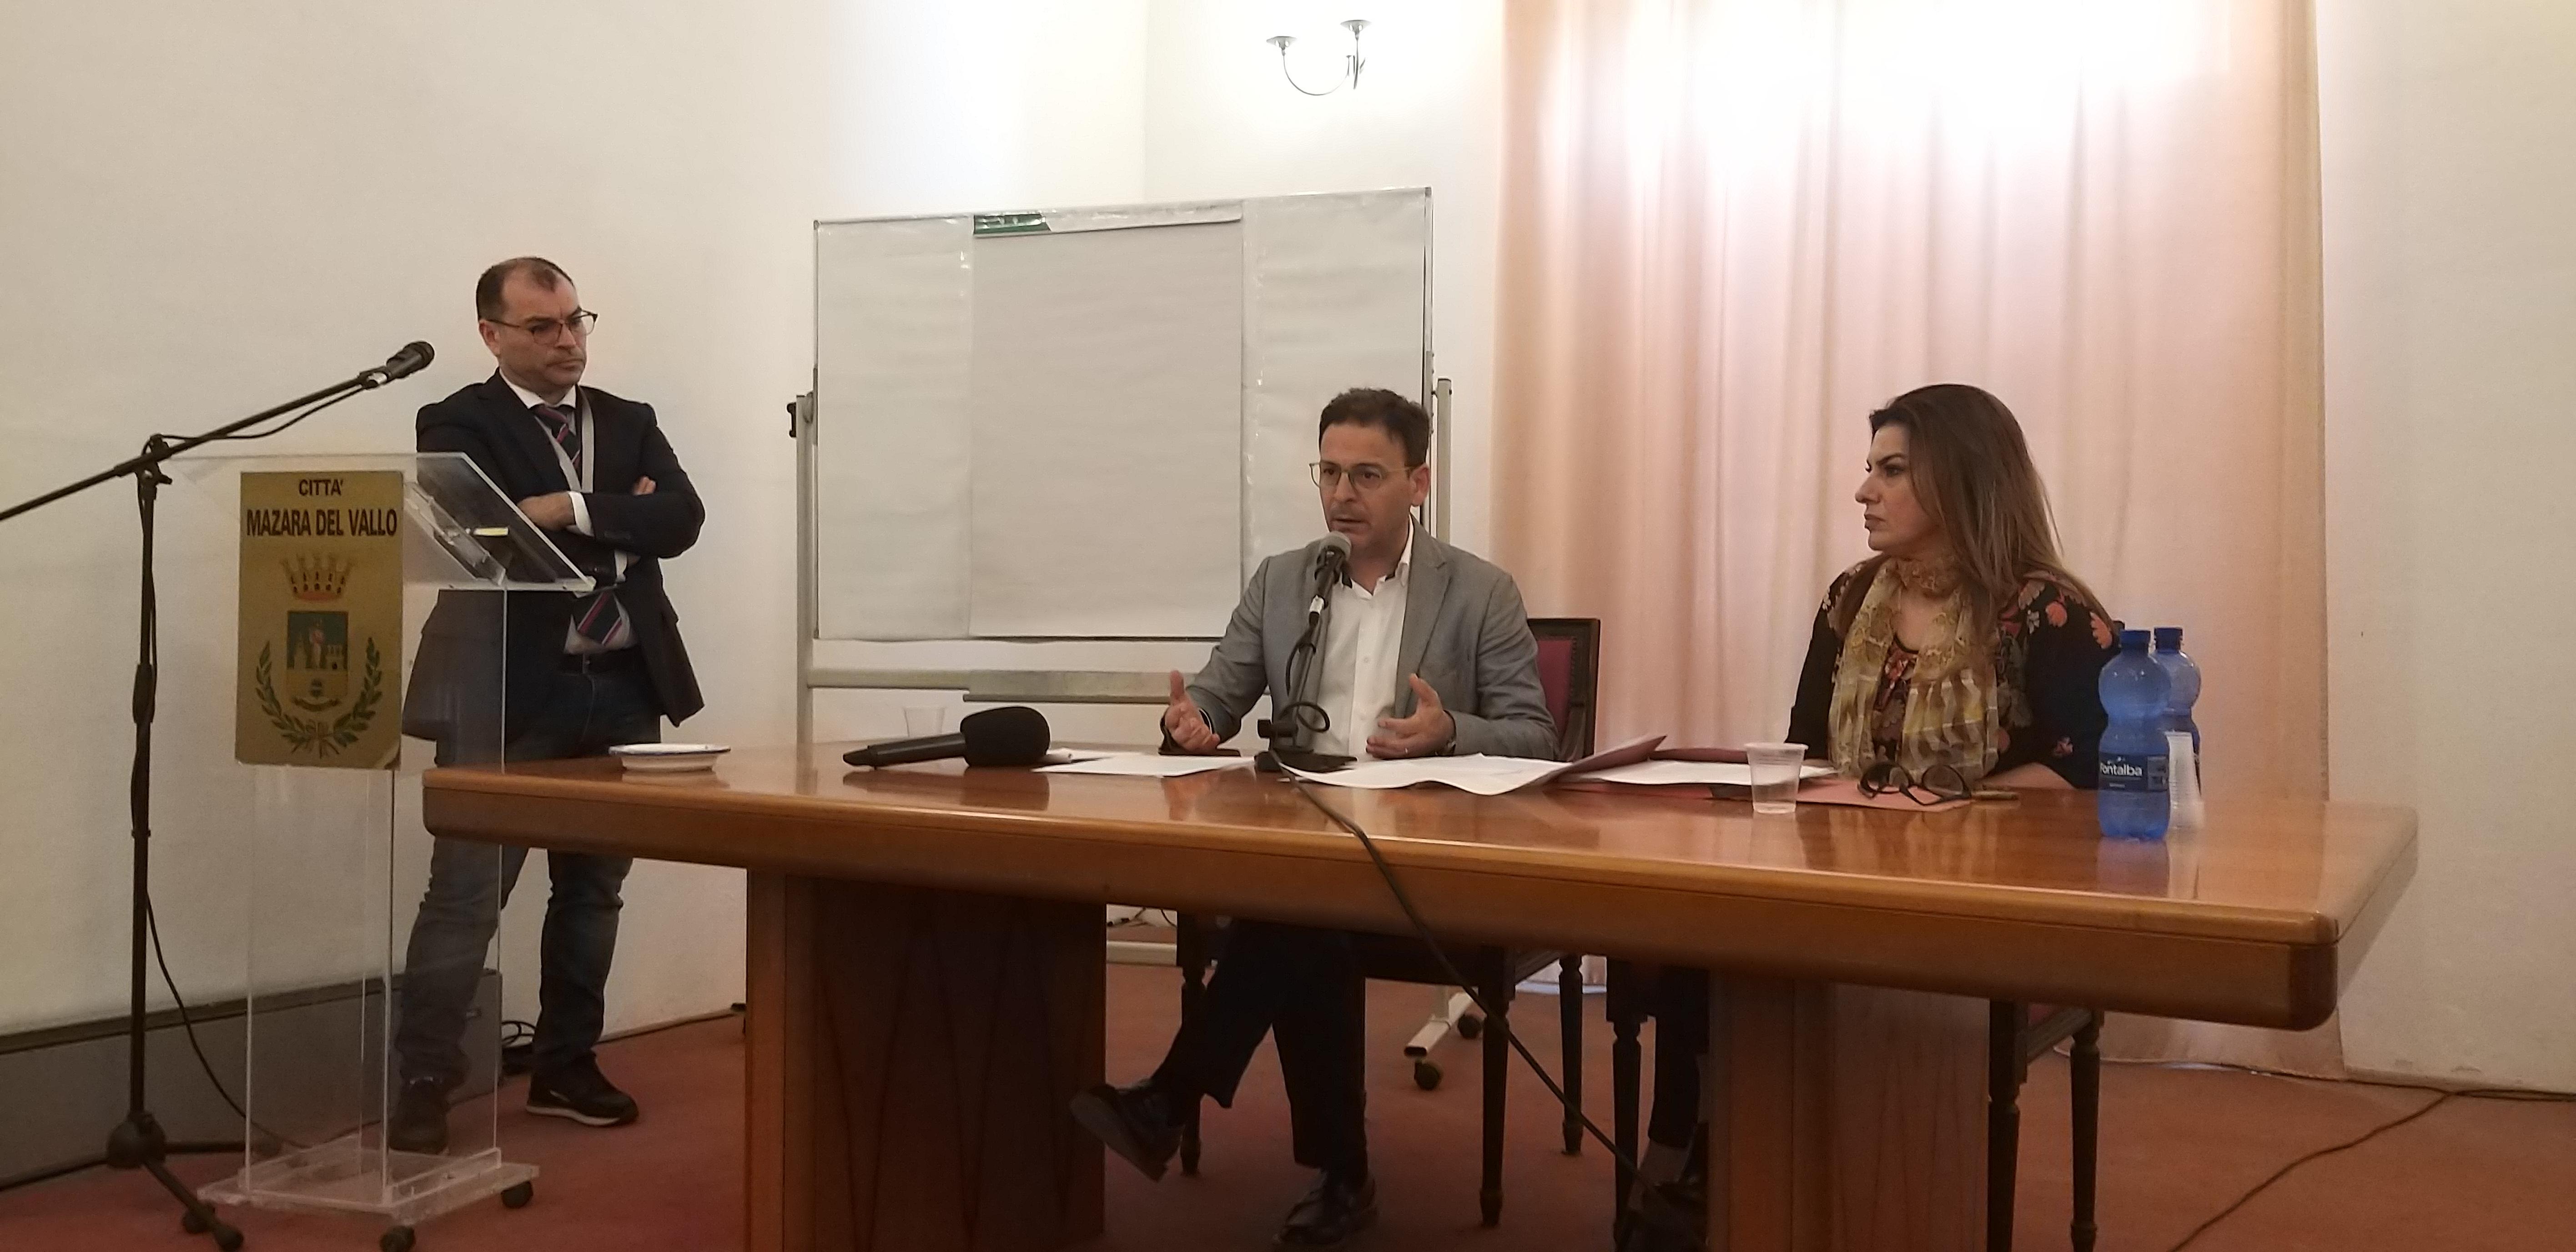 SITUAZIONE RIFIUTI A MAZARA: CONFERENZA STAMPA DEL SINDACO QUINCI E L'ASSESSORE AGATE